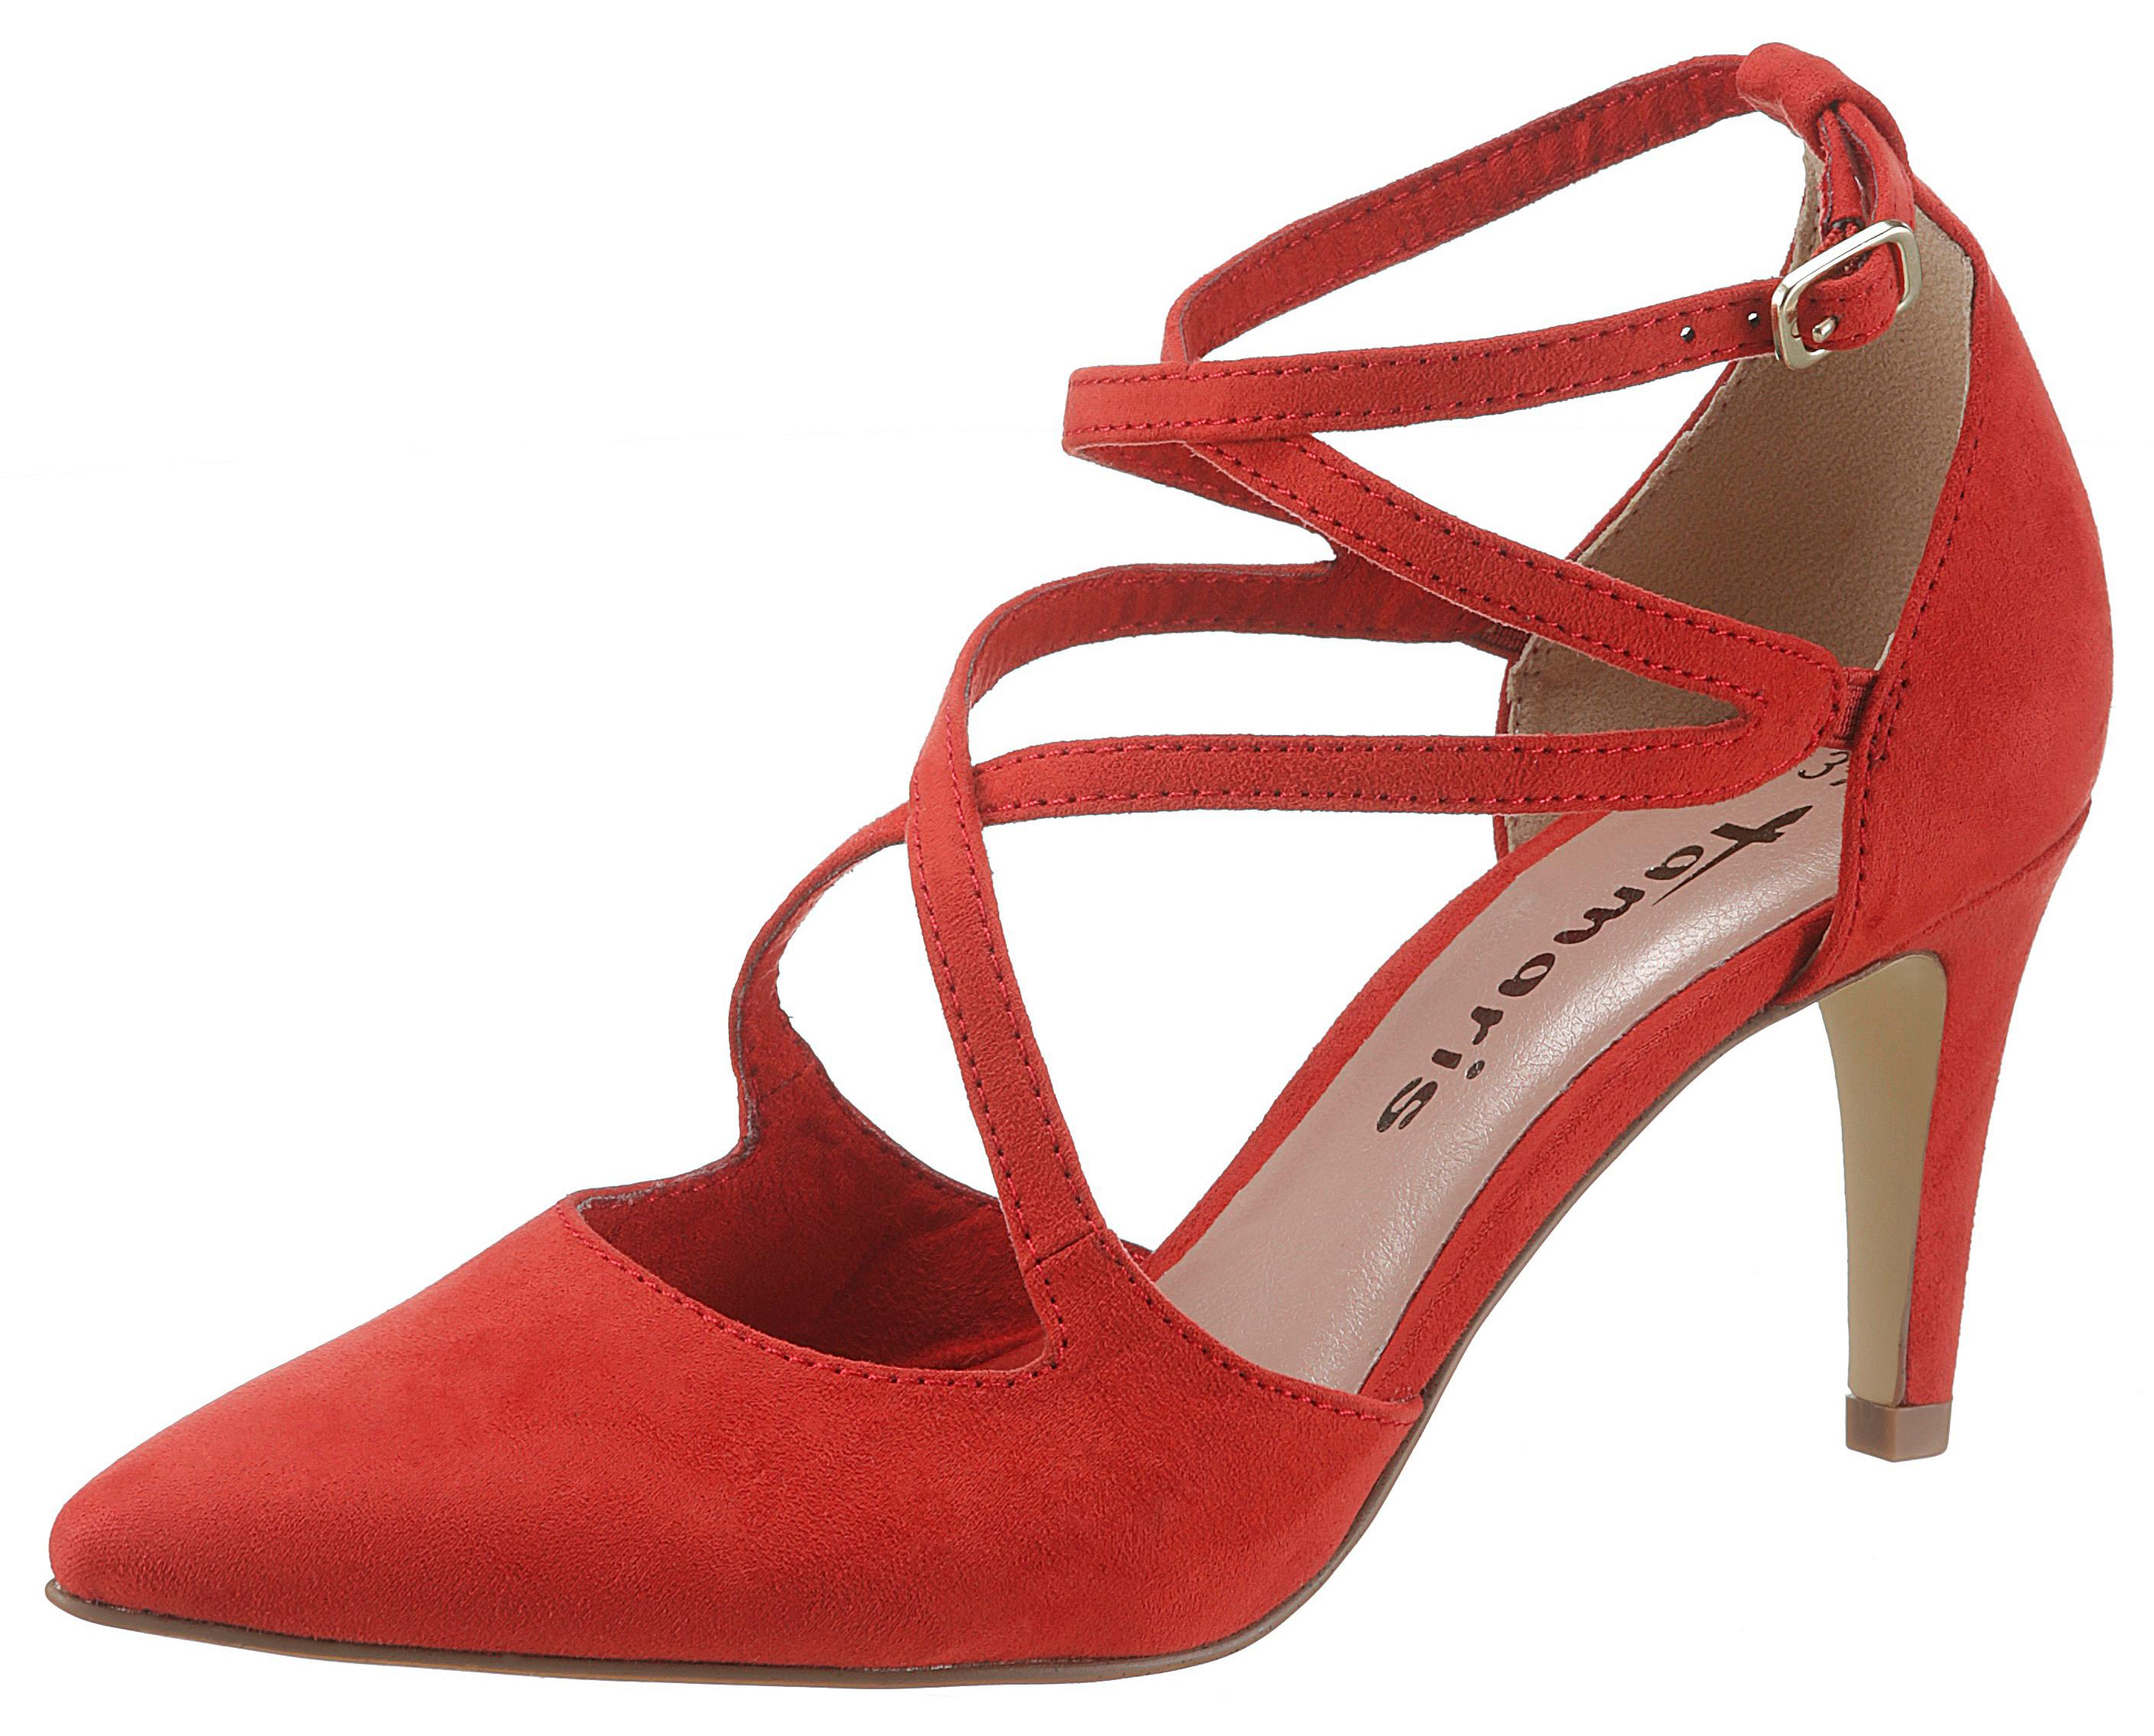 Tamaris Spangenpumps Seagull Damenmode Spangenpumps Damen Schuhe Schuhe Schuhe    Zuverlässiger Ruf  b8f00a